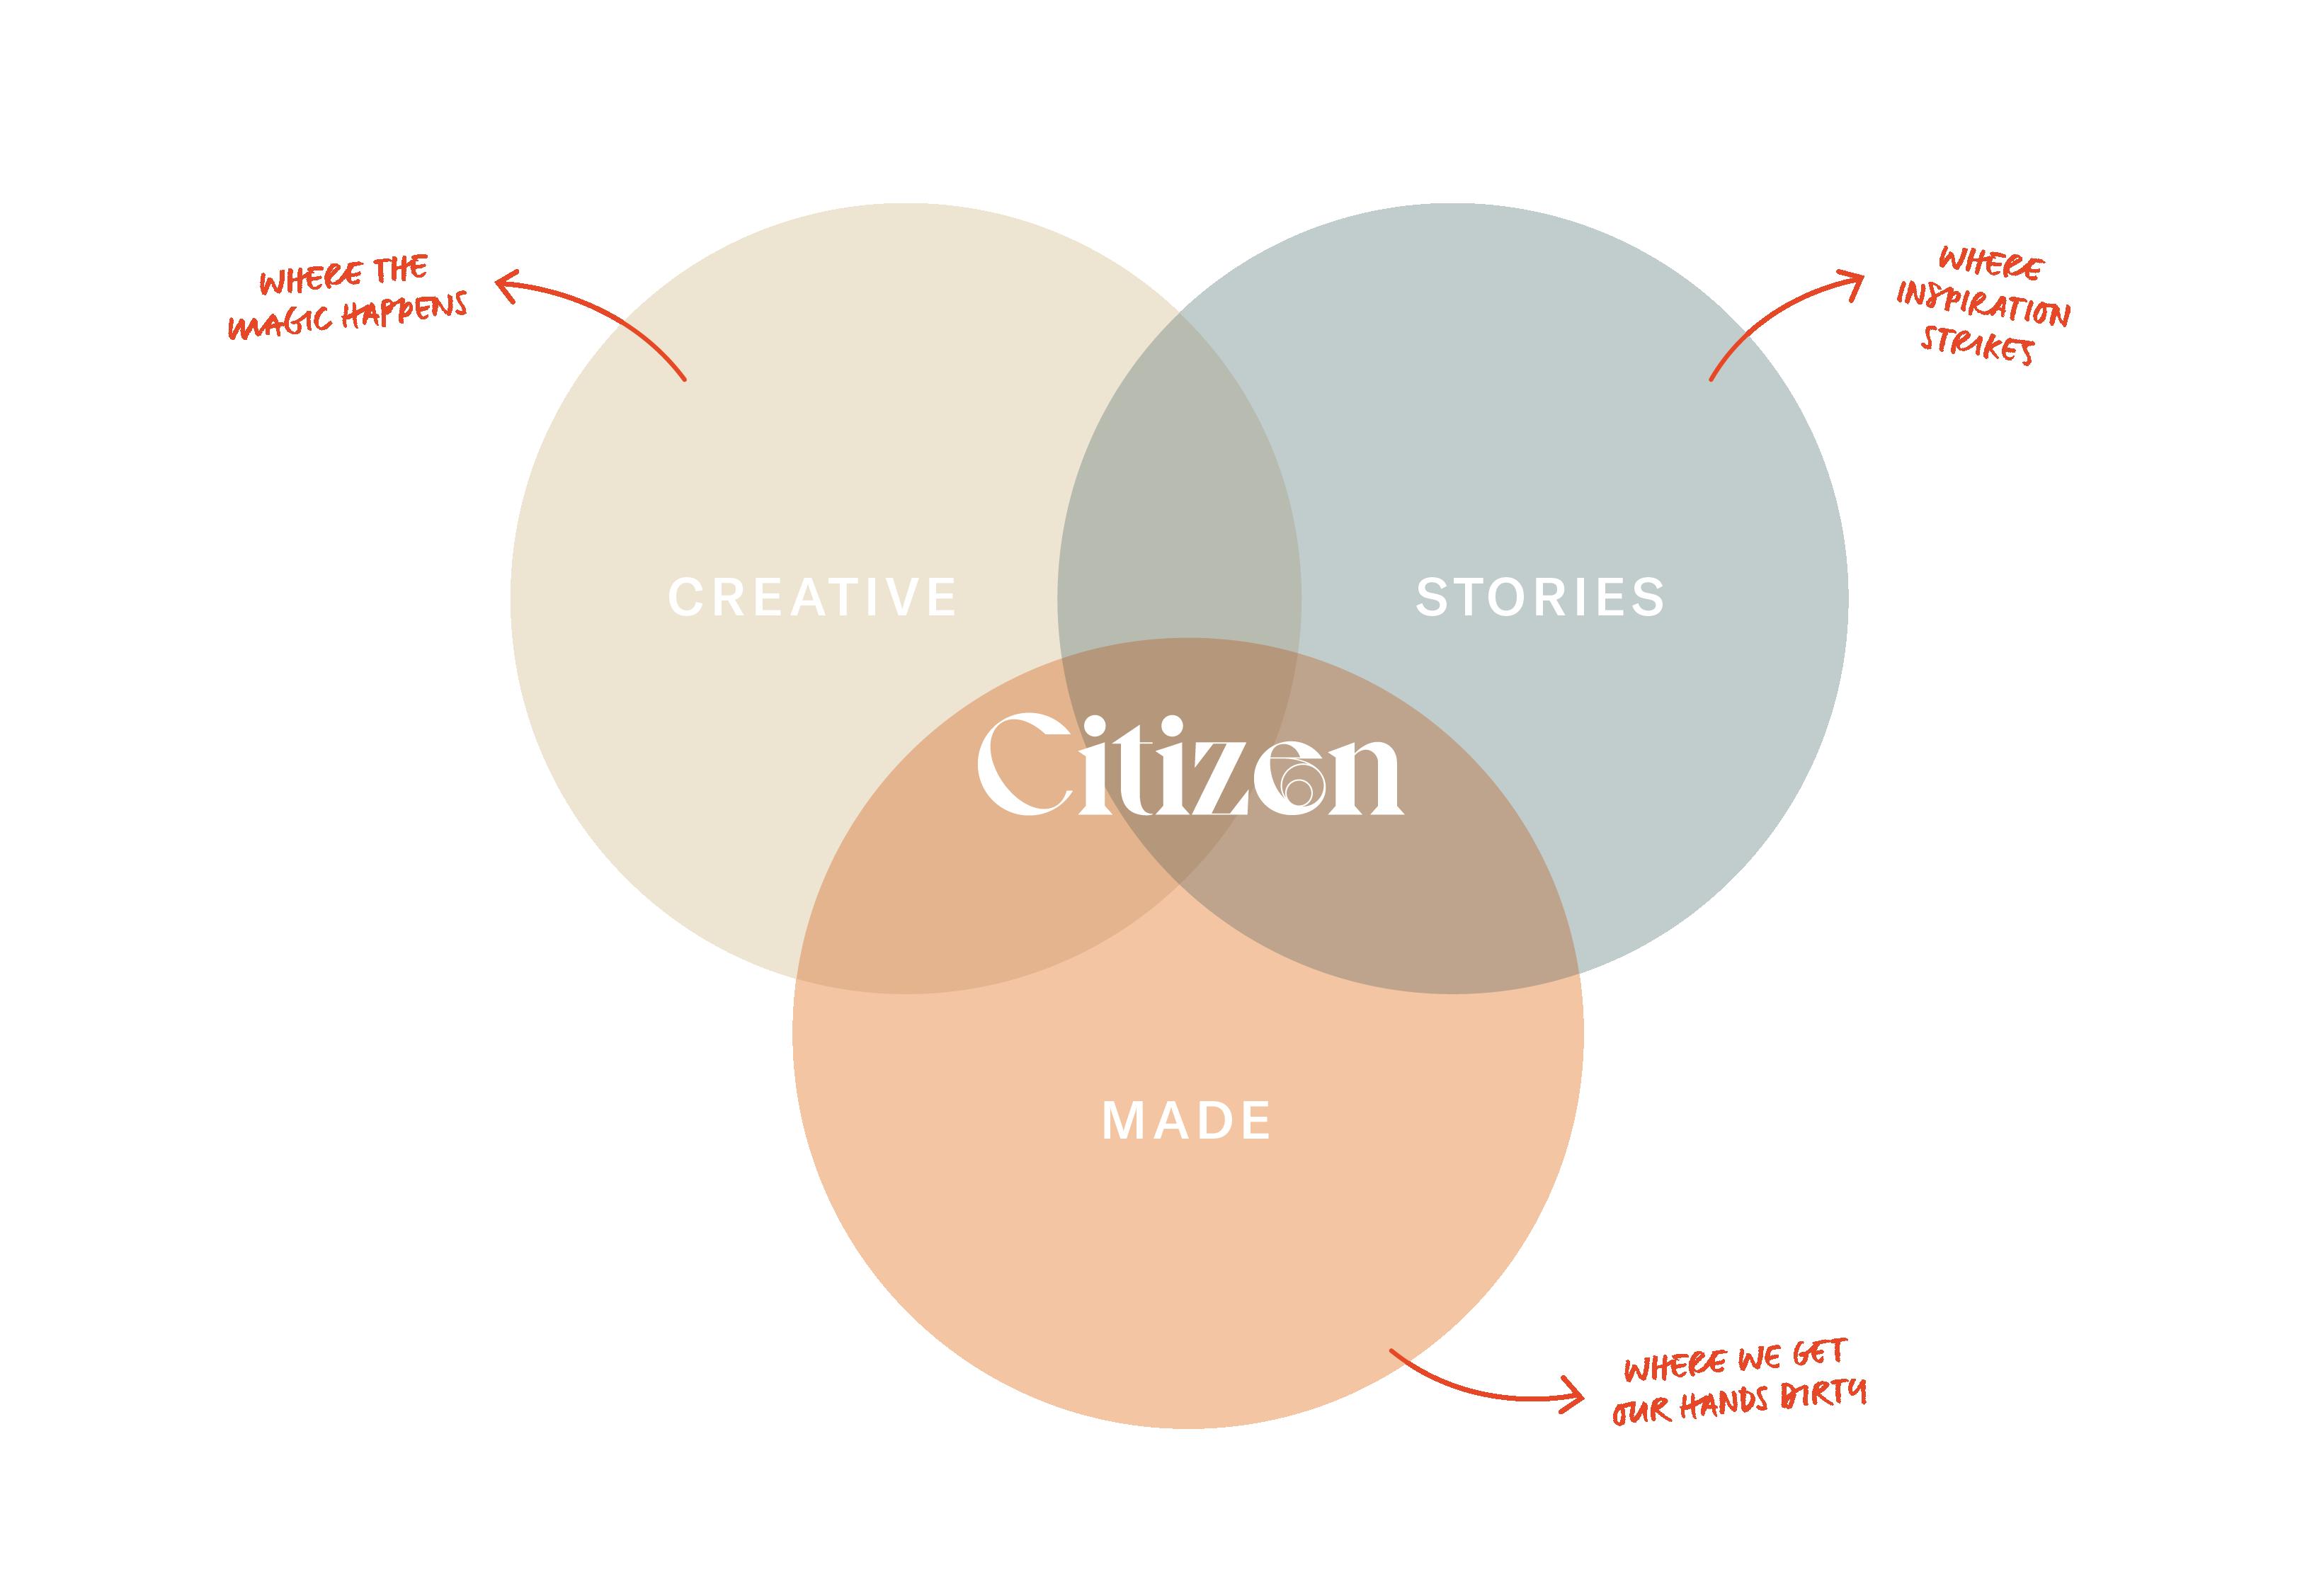 Citizen_Venn-Diagram_V3-01